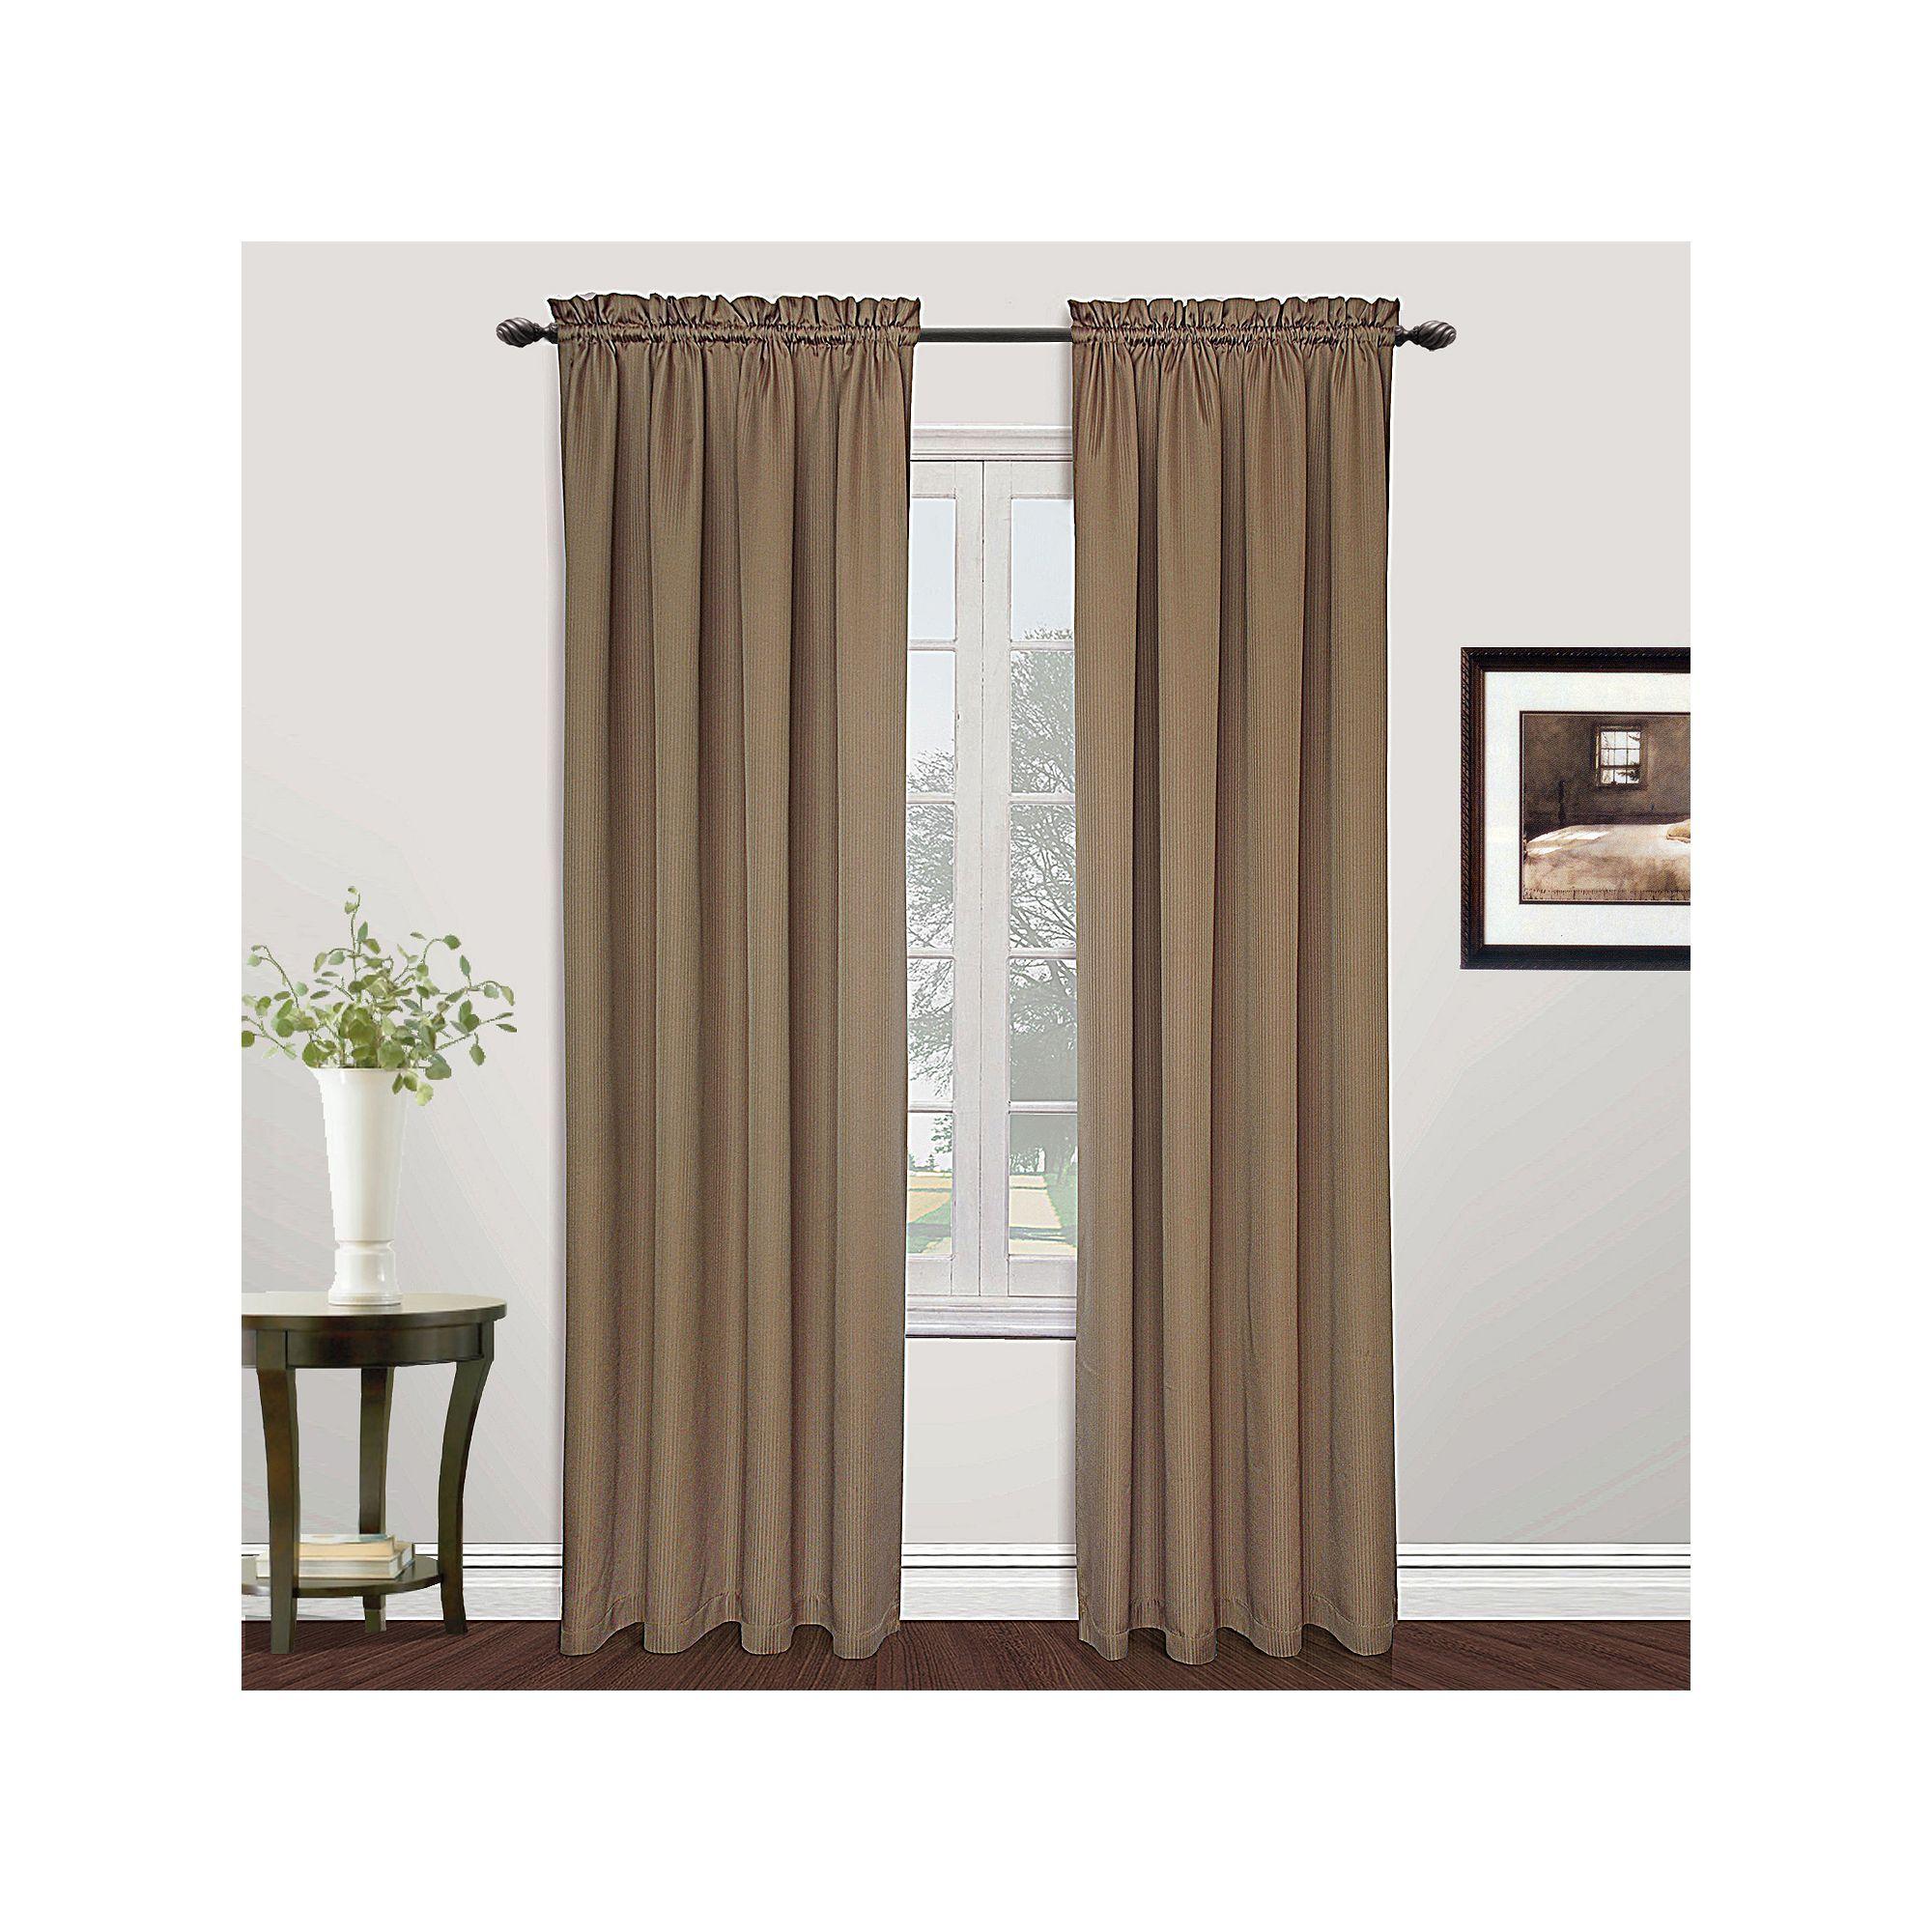 Lovely United Curtain Co. Metro Curtains, Beig/Green (Beig/Khaki)